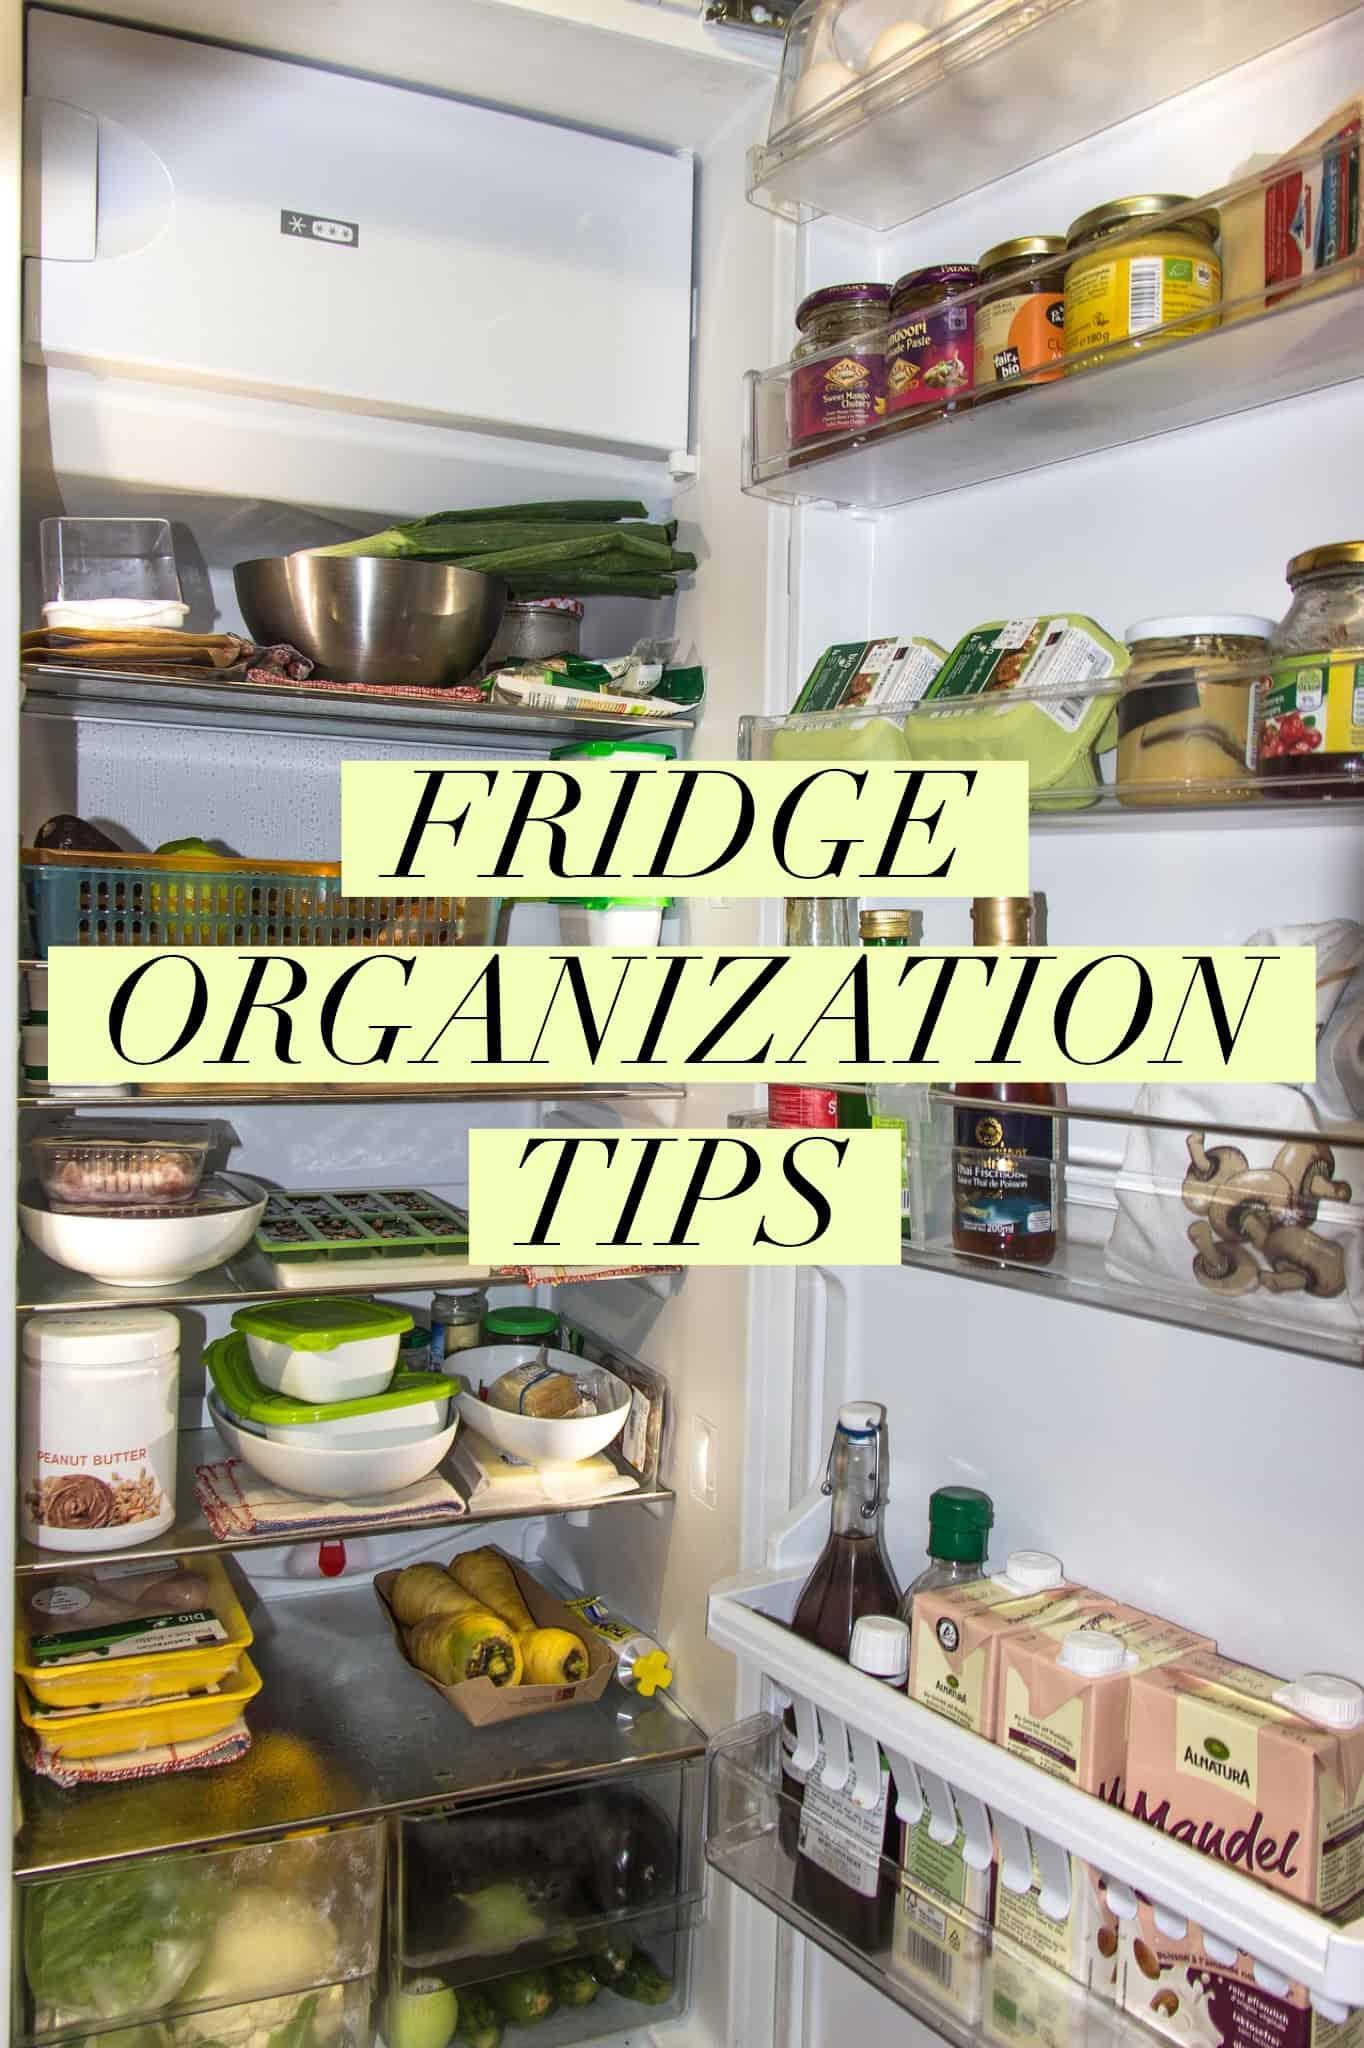 fridge organization tips title